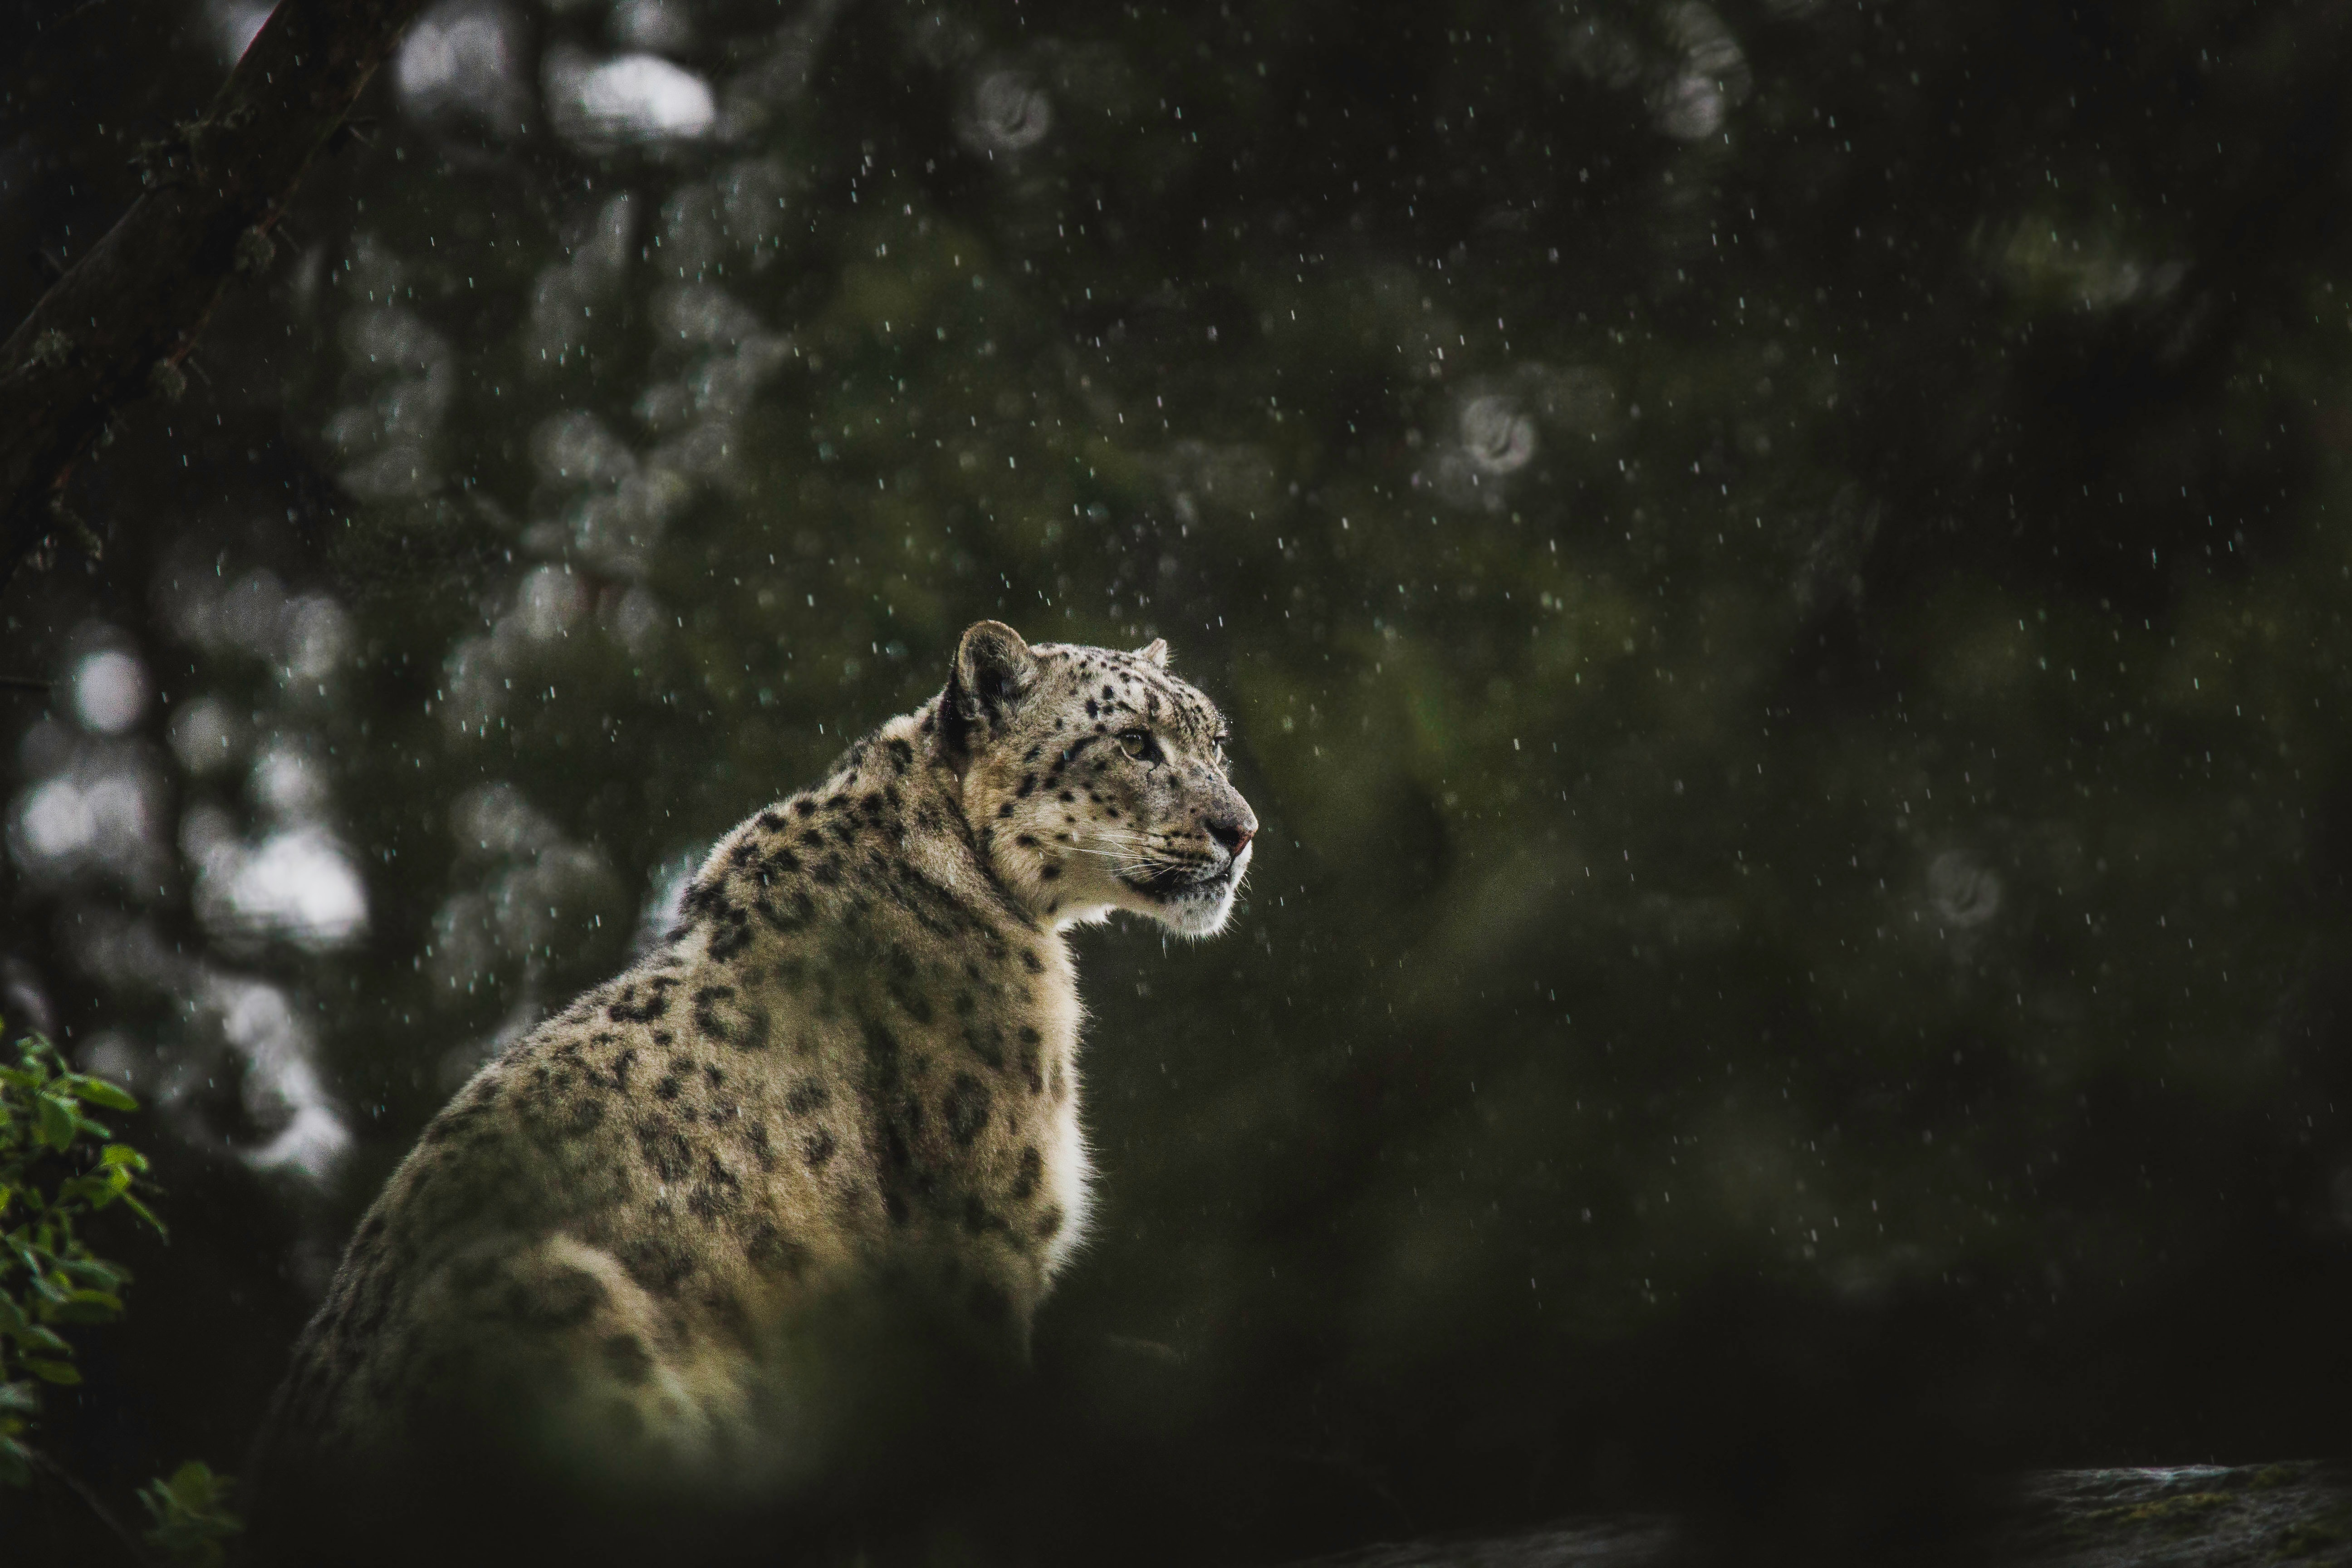 60841 download wallpaper Animals, Snow Leopard, Leopard, Big Cat, Predator, Rain, Wildlife screensavers and pictures for free